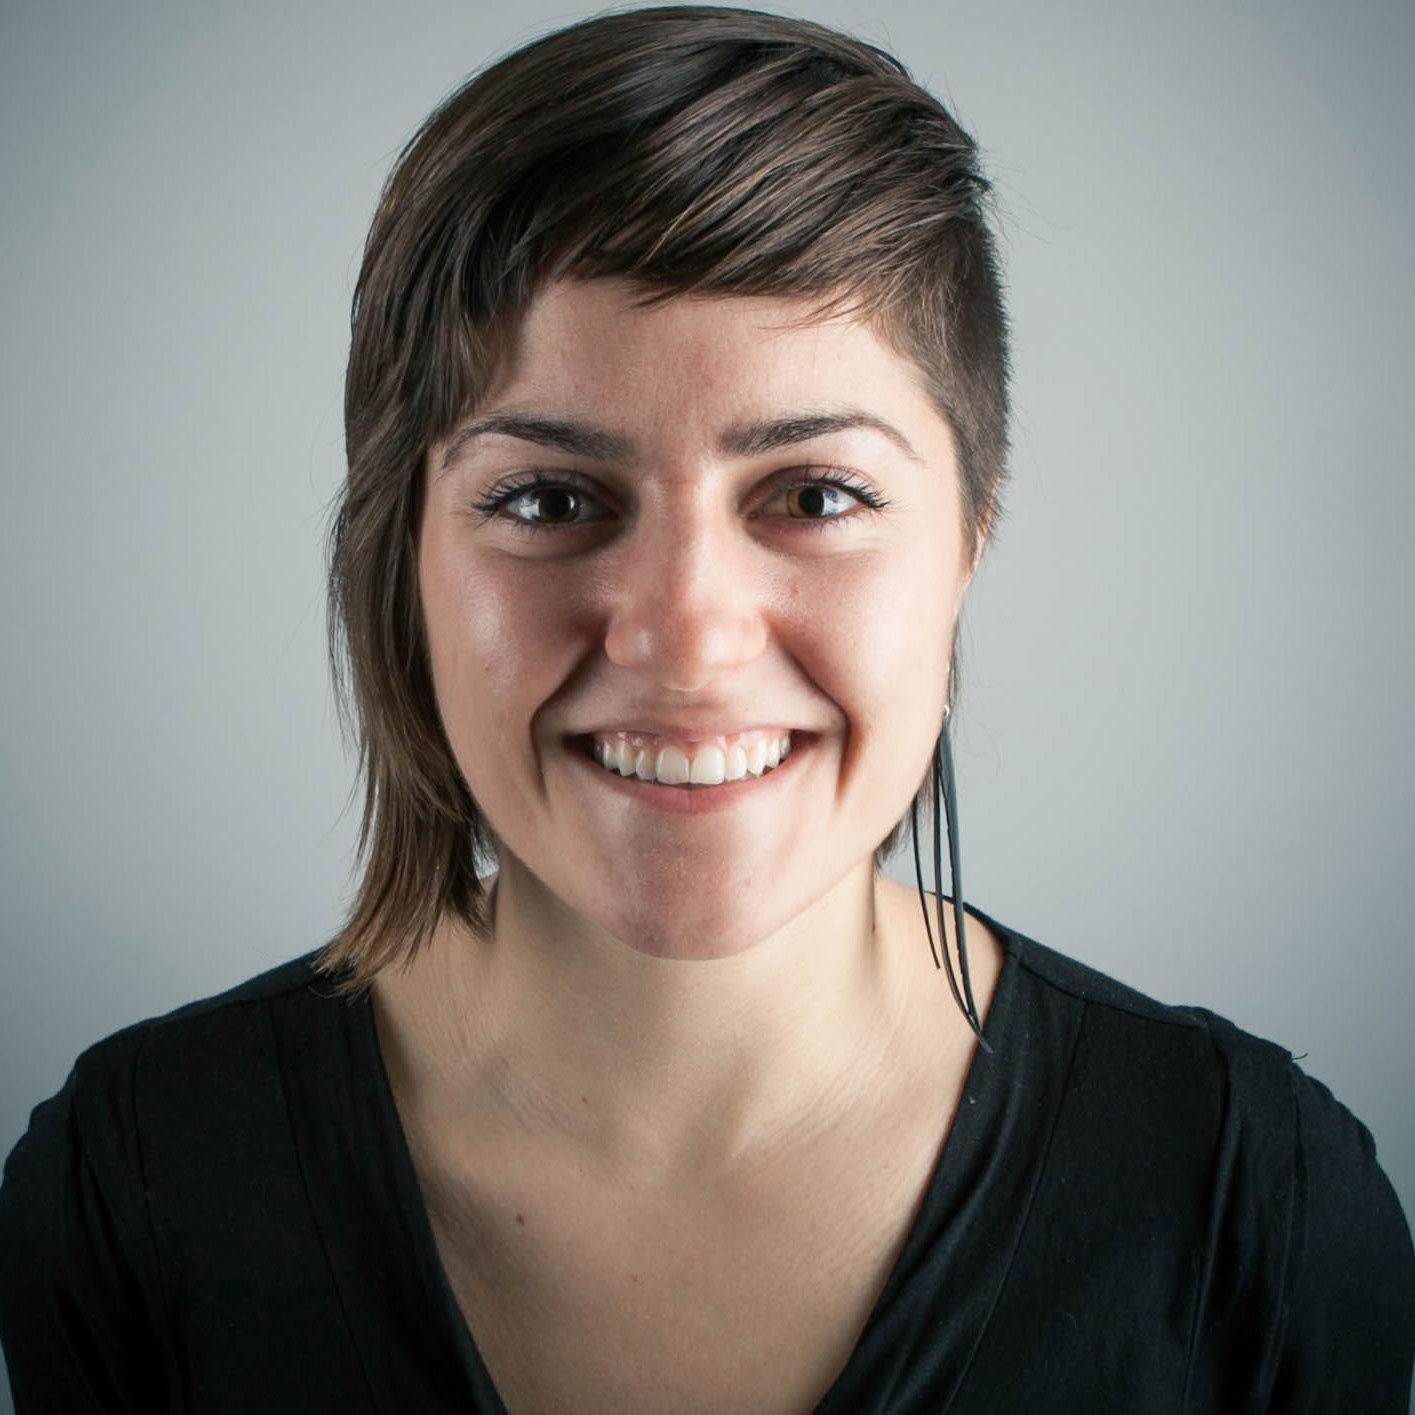 Georgetown SCS Journalism Alumna, Christina Cauterucci